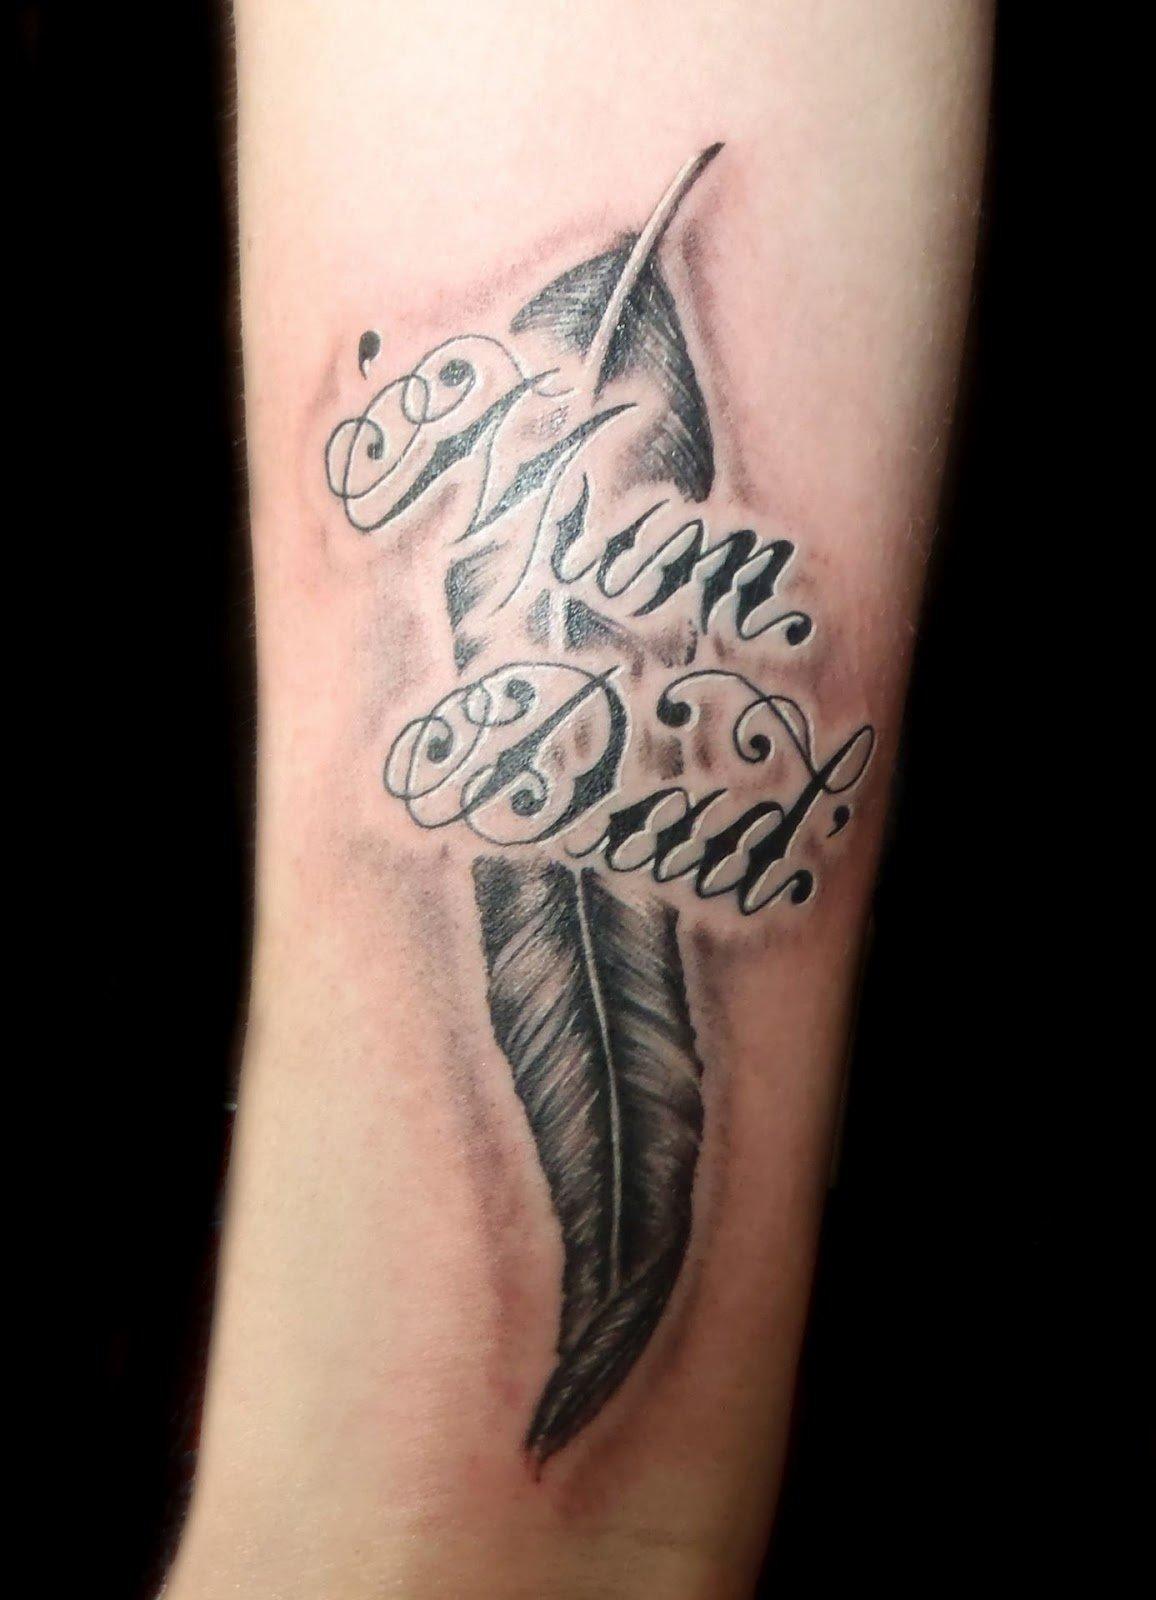 10 Unique Mom And Dad Tattoos Ideas 65 incredible mom tattoos ideas 2020